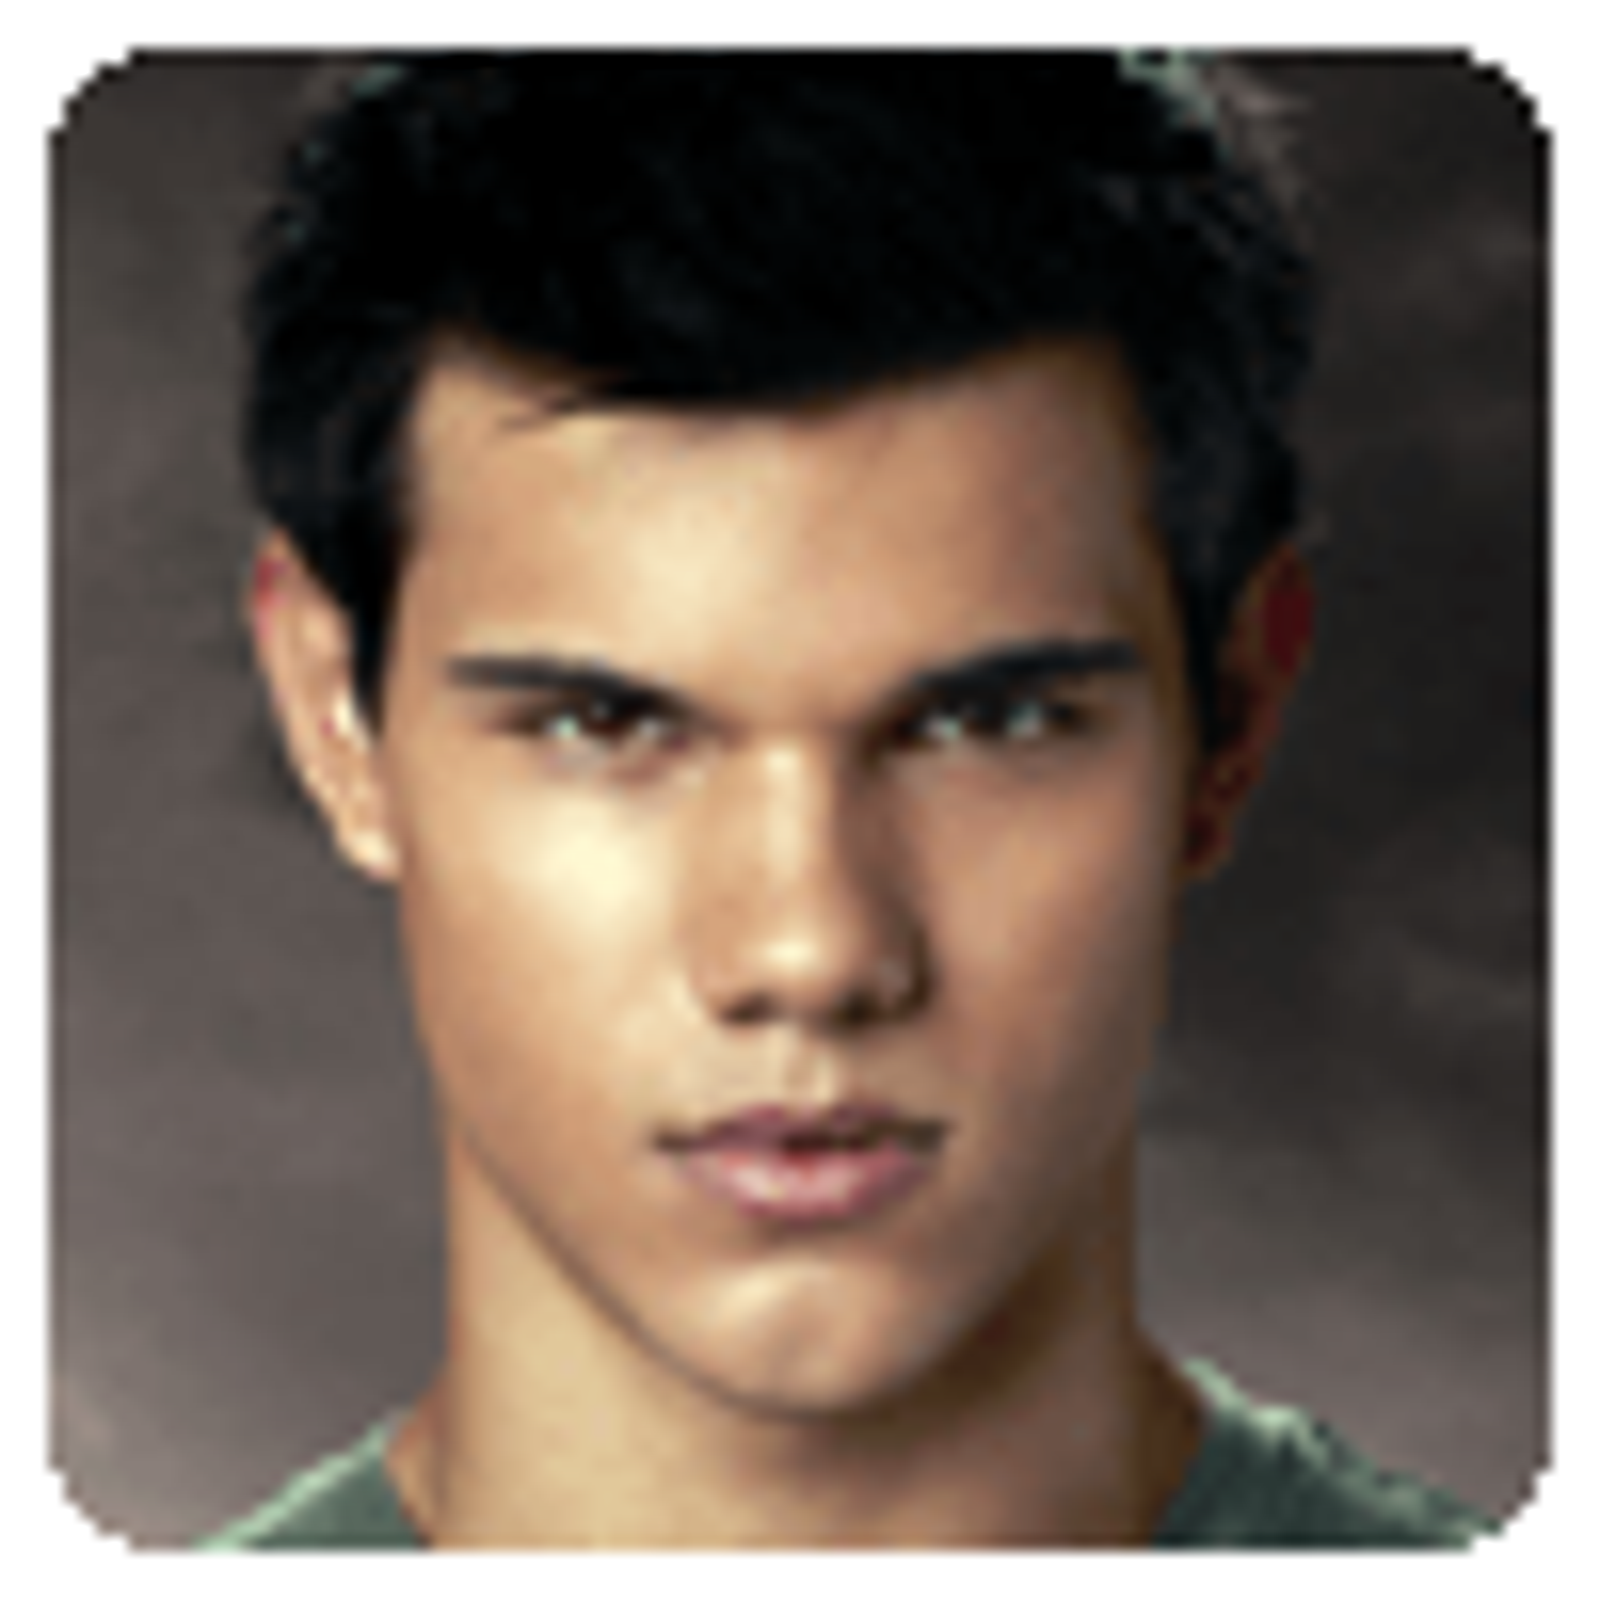 Taylor Lautner - Twilight Fond d'écran